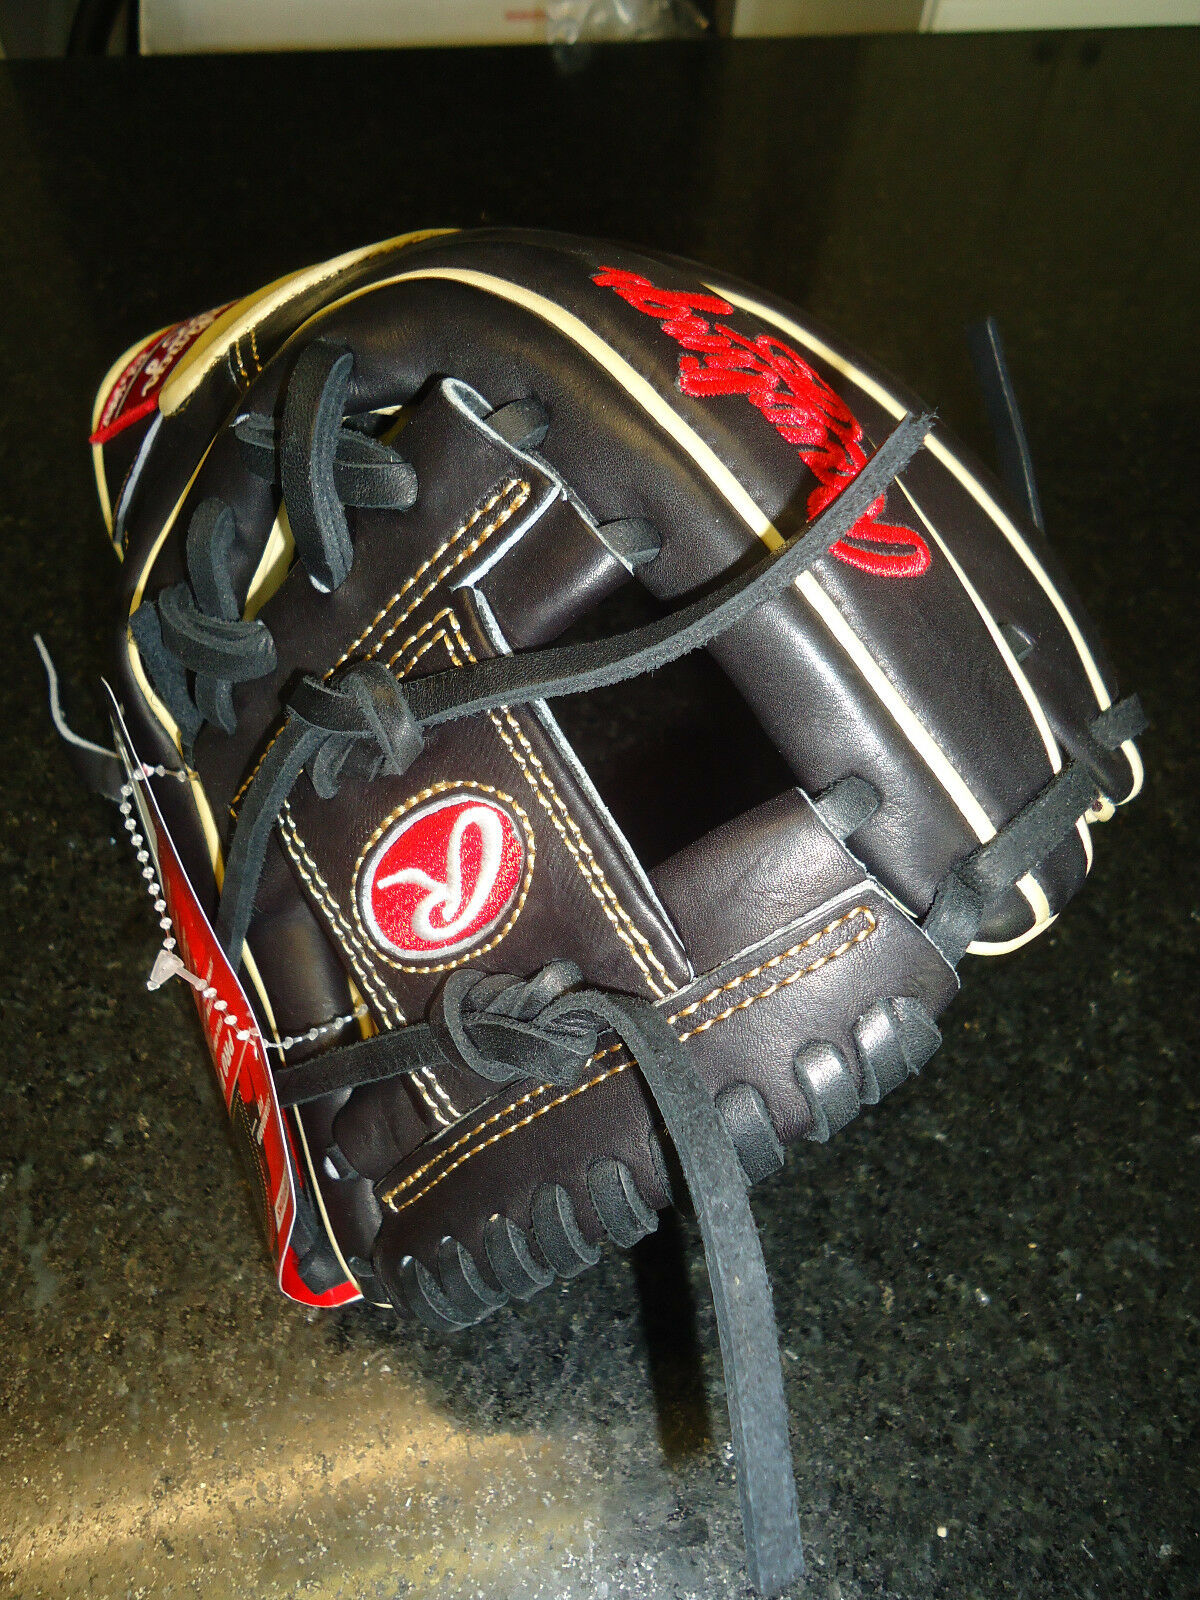 Rawlings Pro preferido 312-2CB pros Guante de béisbol 11.25  RH -  359.99